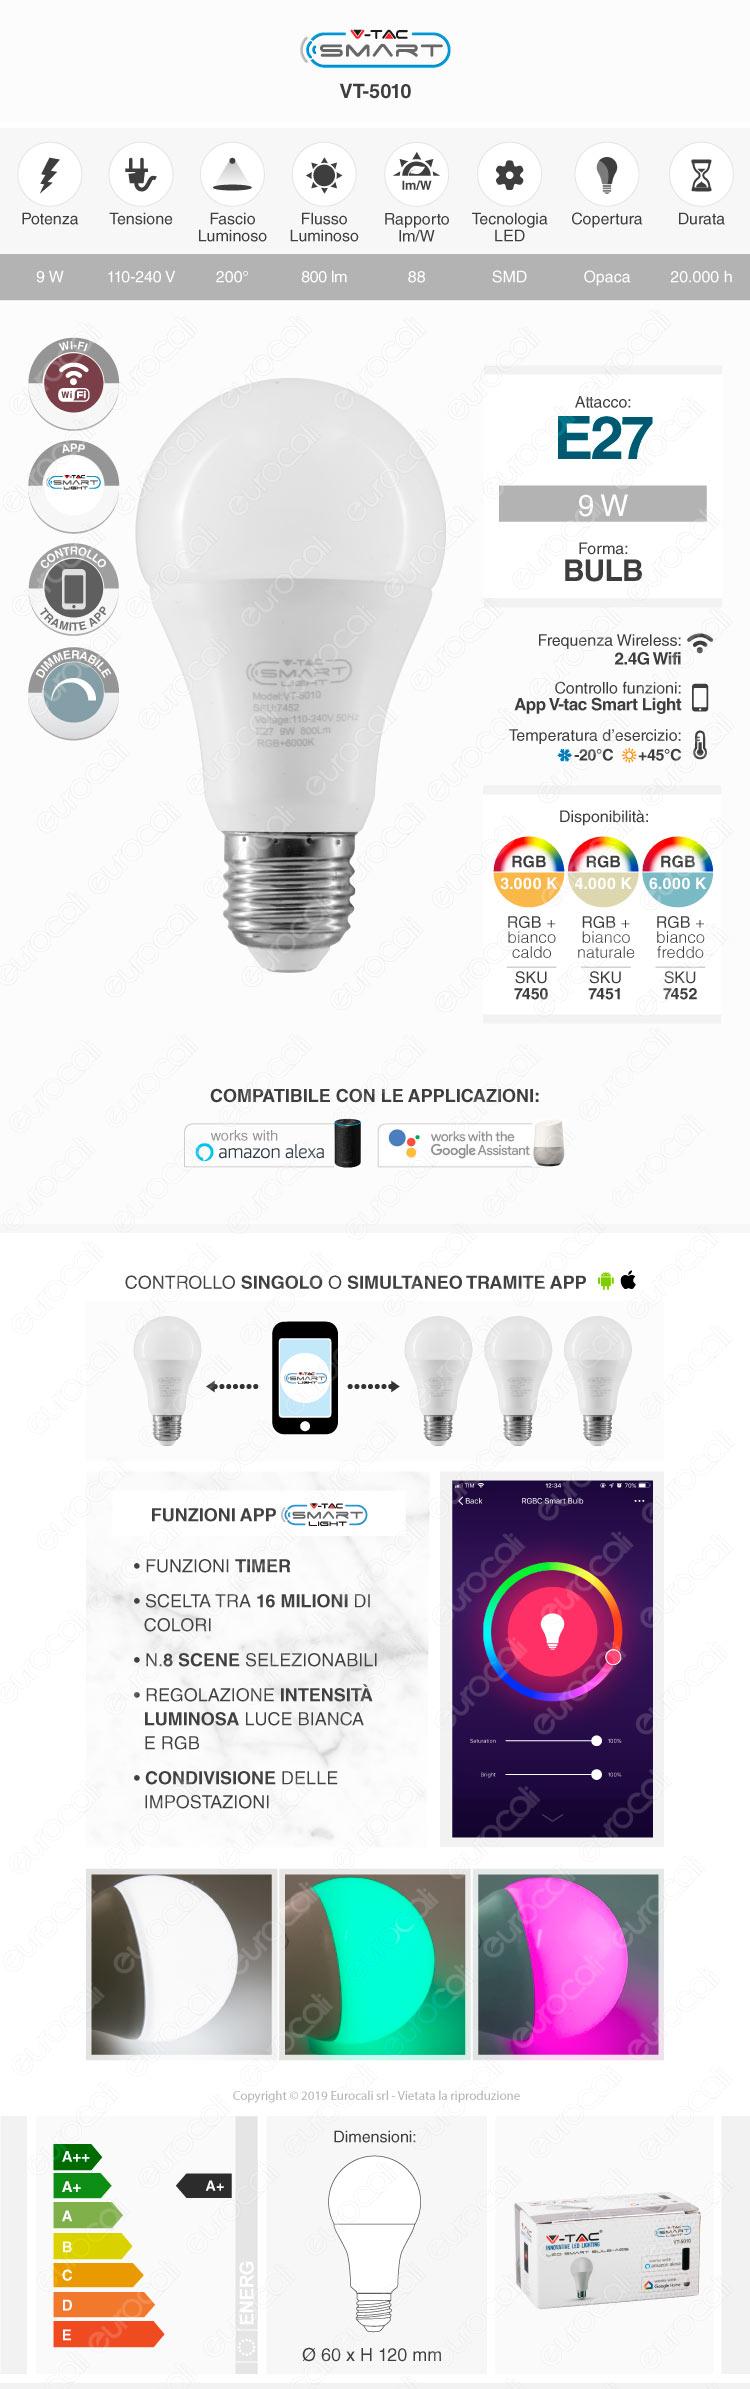 V-Tac Smart VT-5010 Lampadina LED Wi-Fi E27 9W Bulb A60 RGB+W Dimmerabile